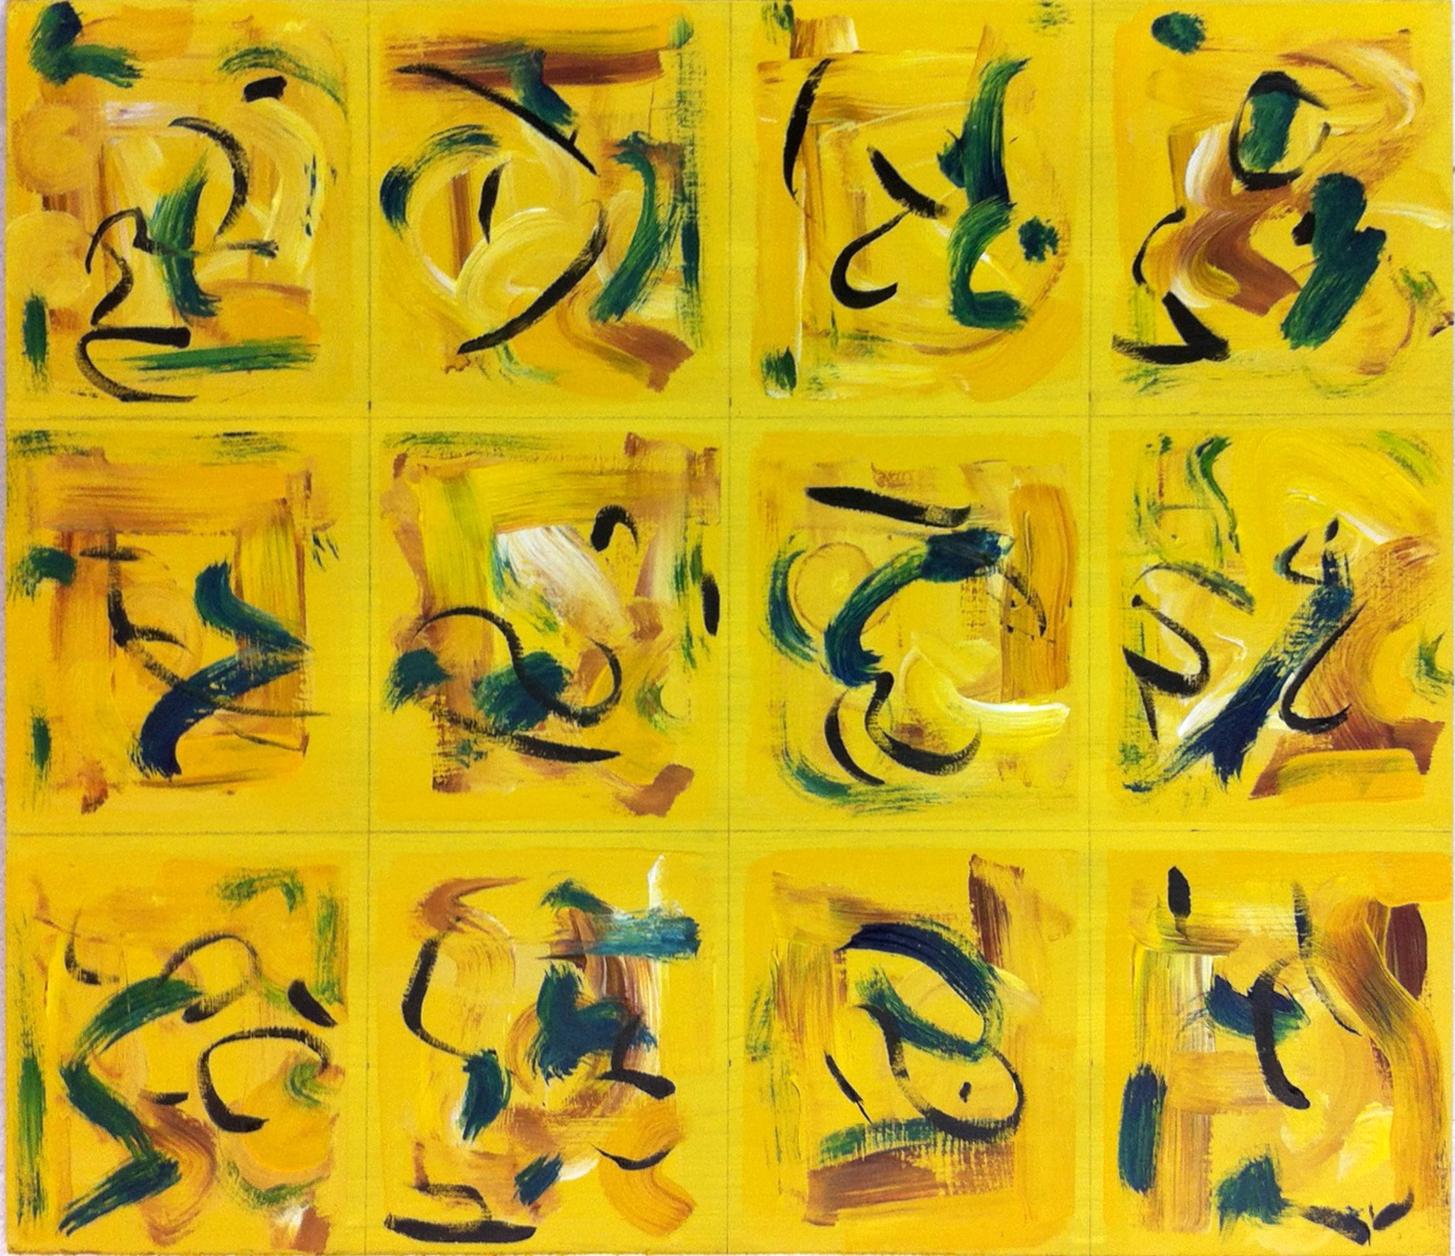 GLYPHSGLIFOS (yellow).JPG